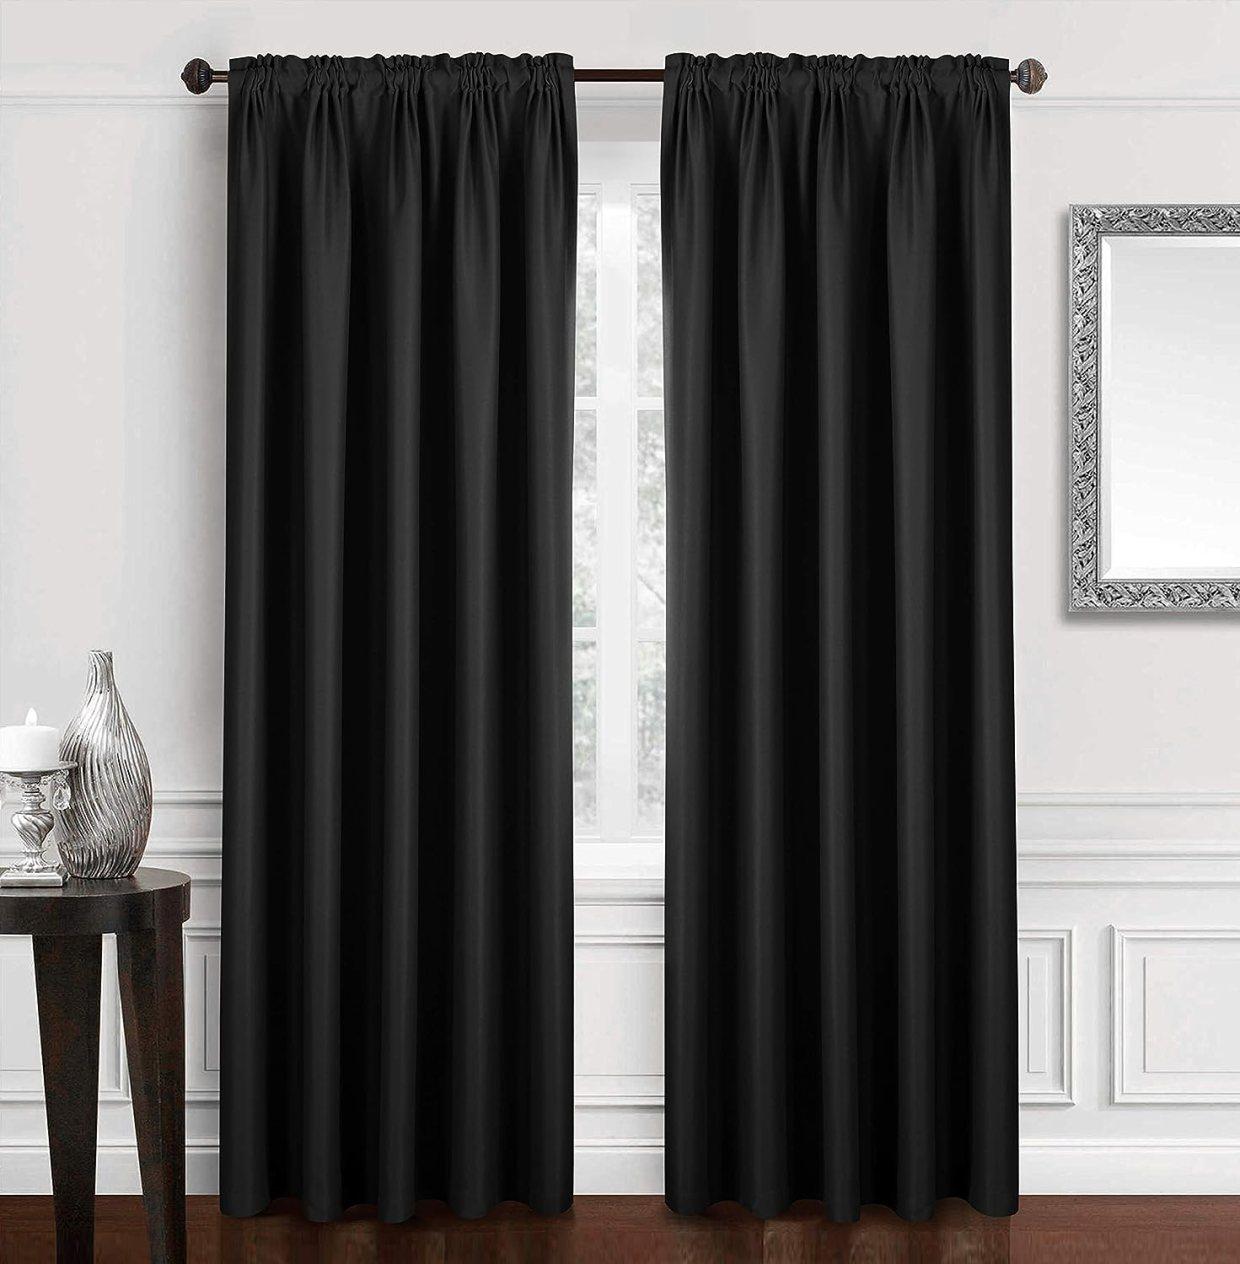 Cortinas elegantes negras para la habitacionhttps://amzn.to/2C4cy3v